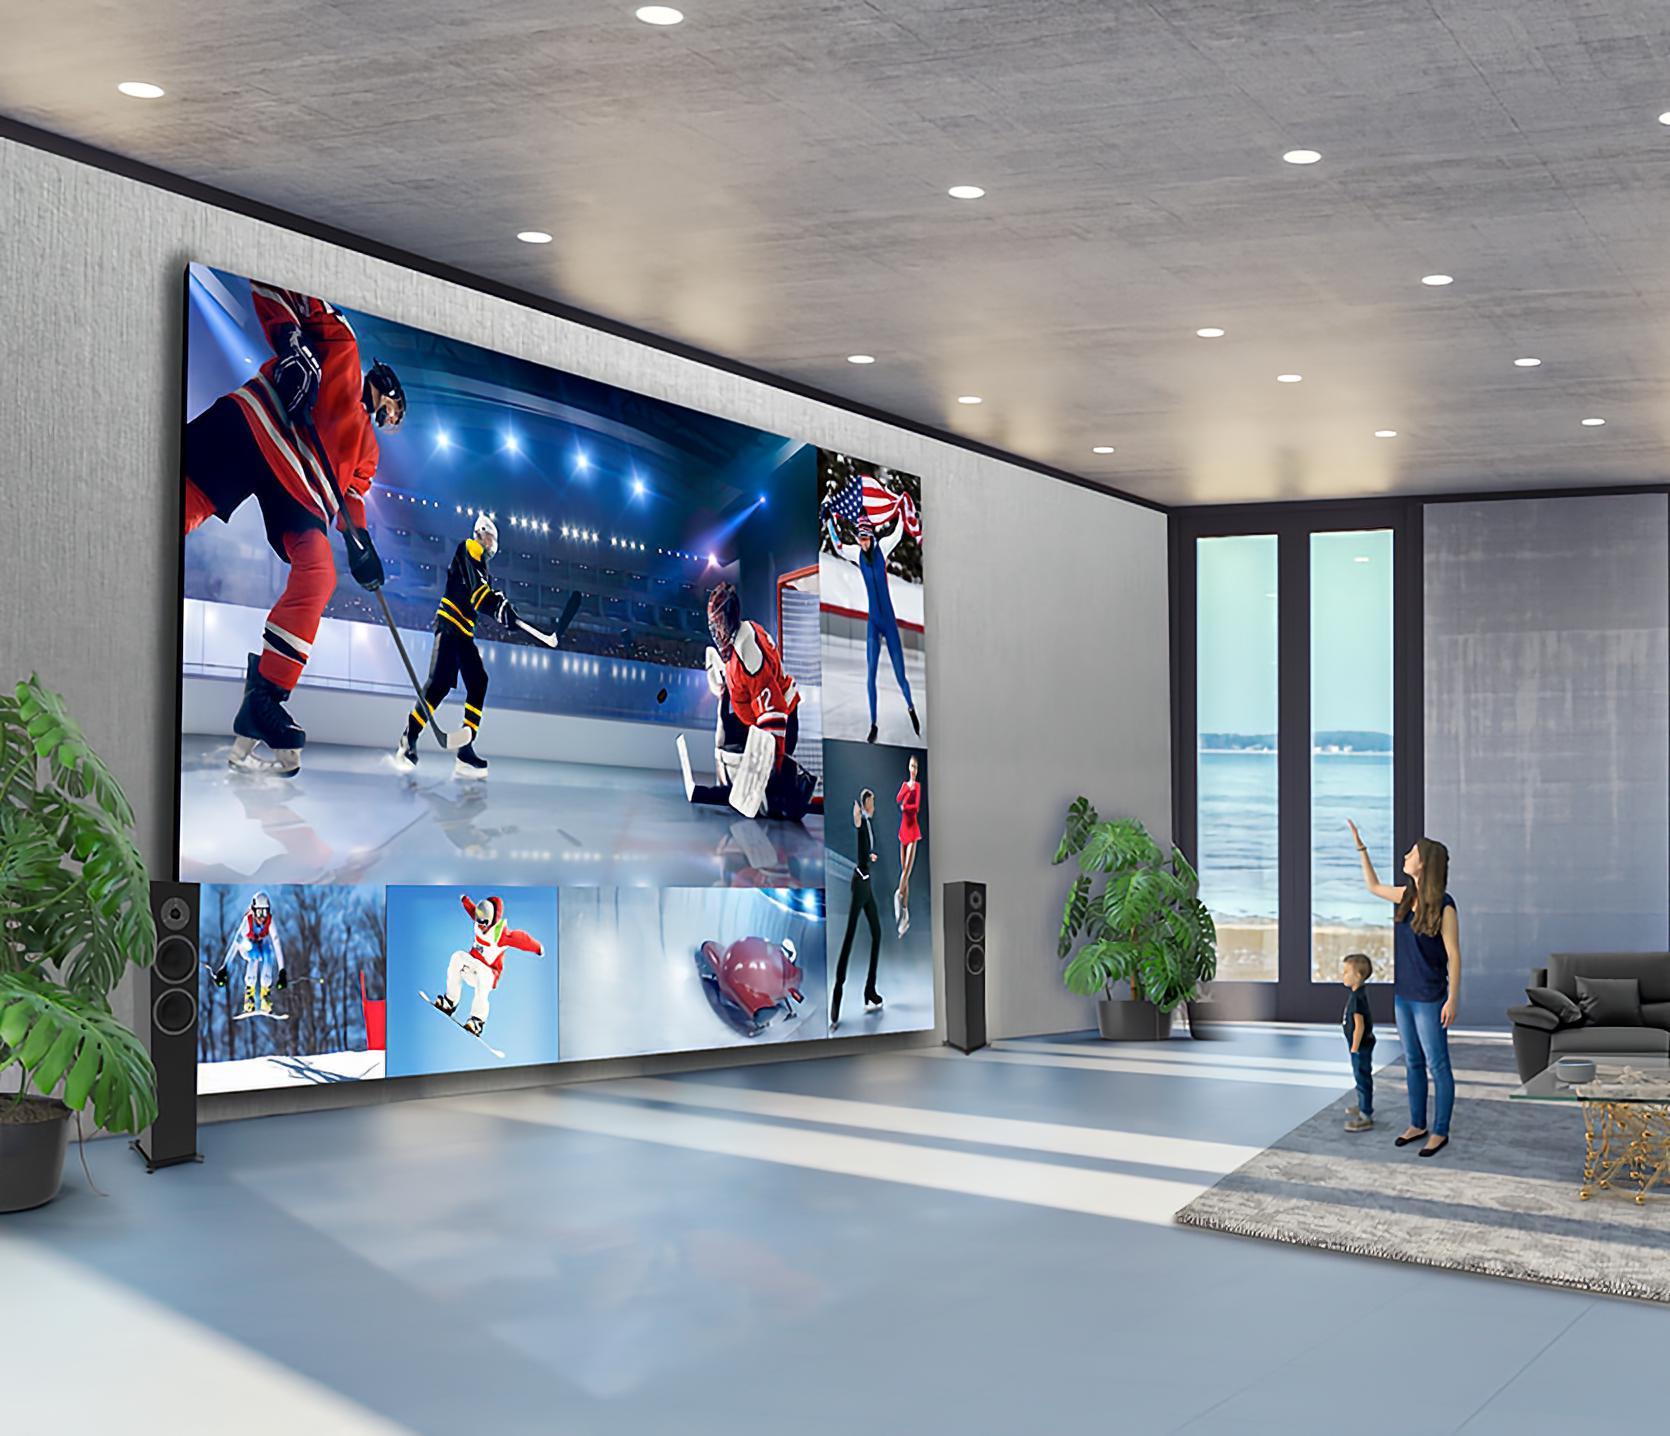 LG 325-inch Direct View LED DVLED 8K TV 1.7 Million